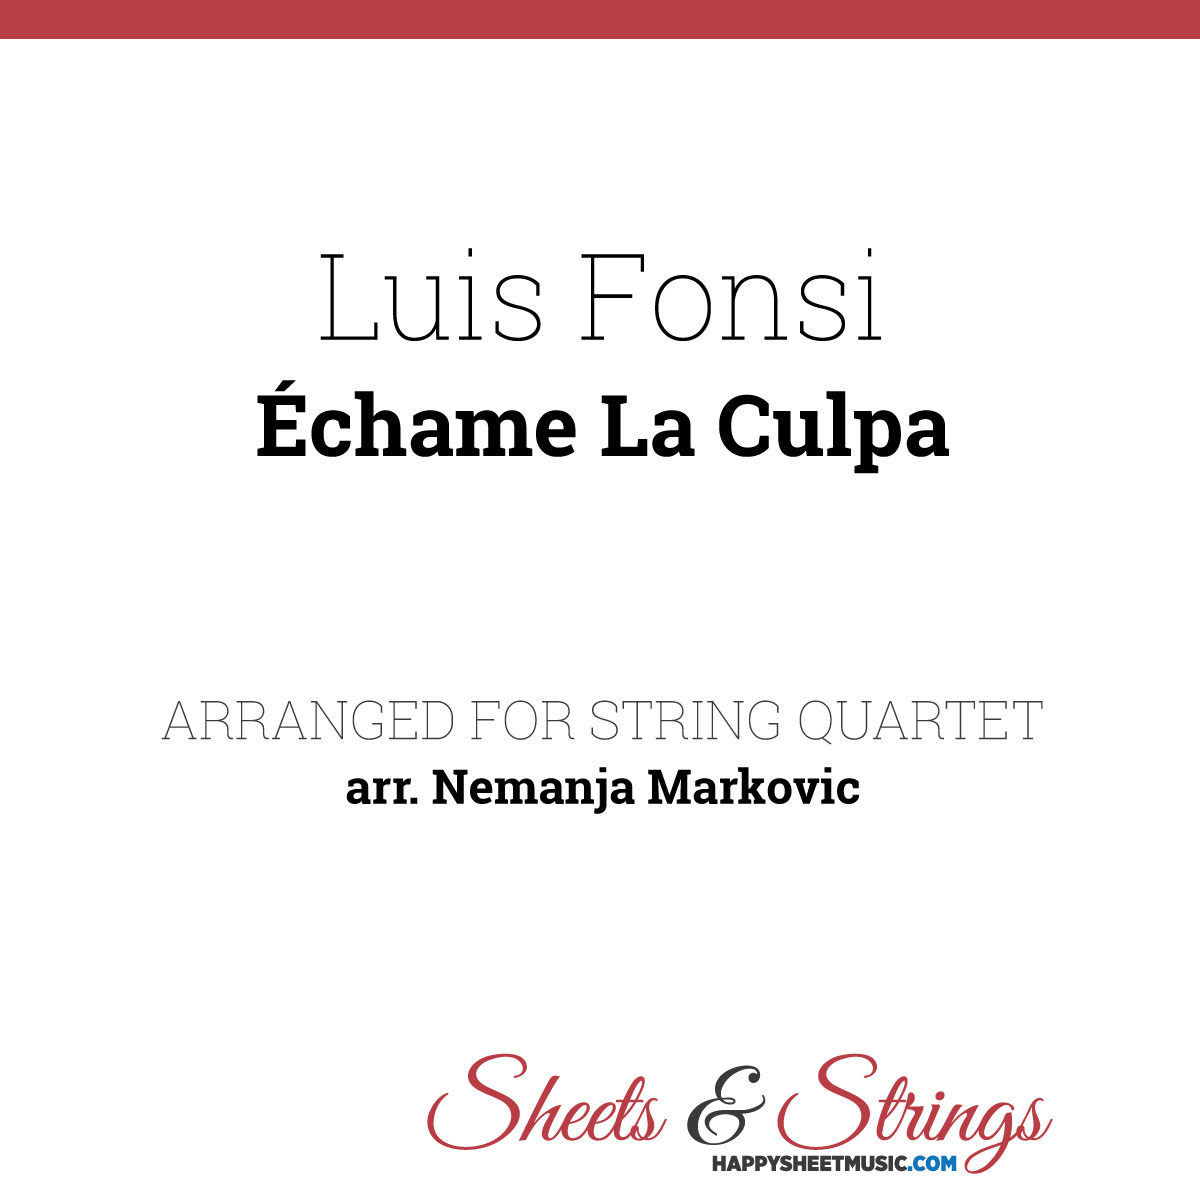 Luis Fonsi ft Demi Lovato - Échame La Culpa Sheet Music for String Quartet